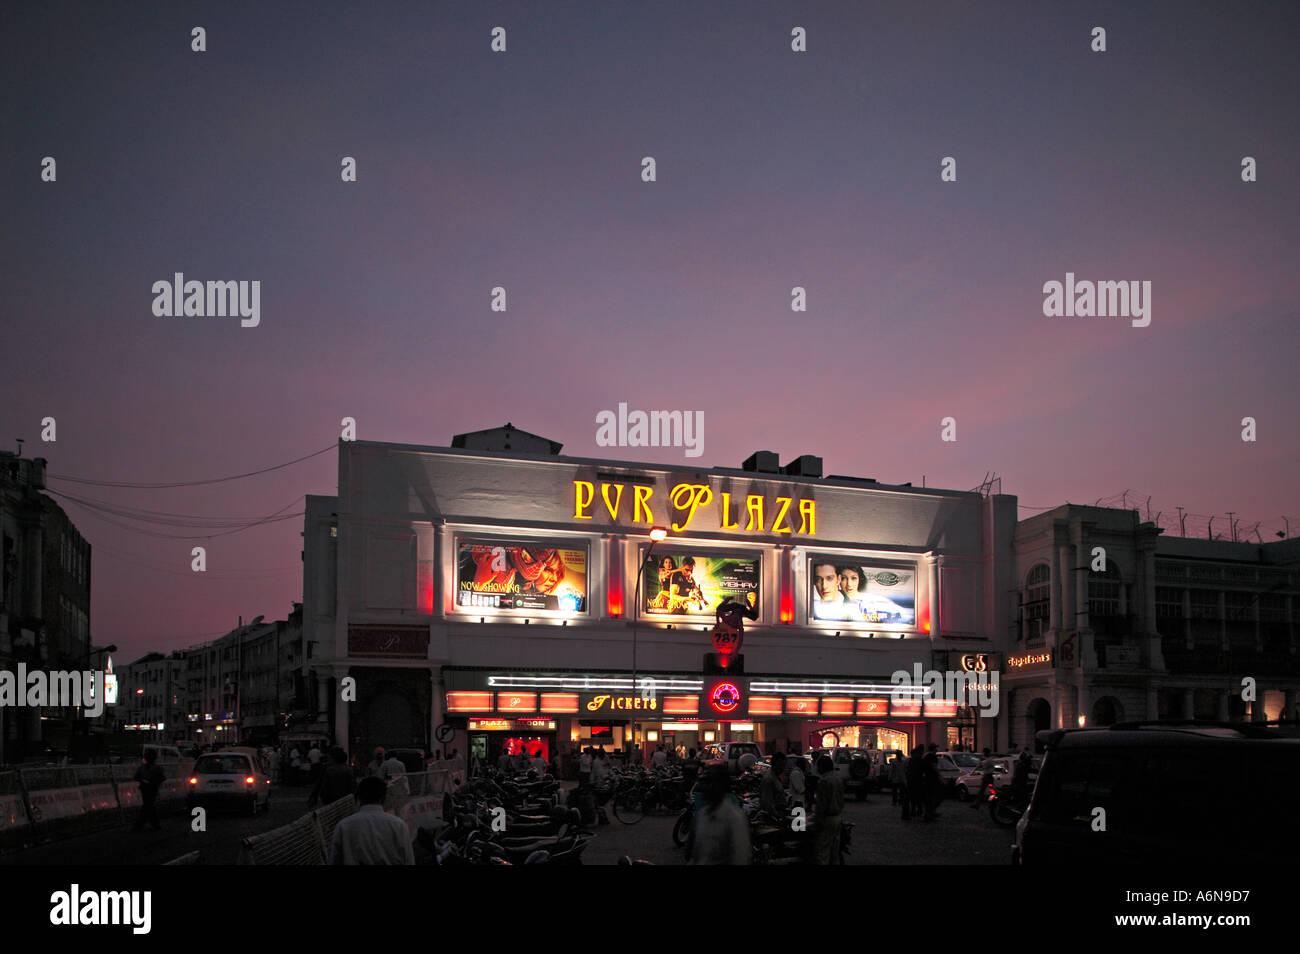 Plaza Cinema Connaught Place New Delhi India - Stock Image